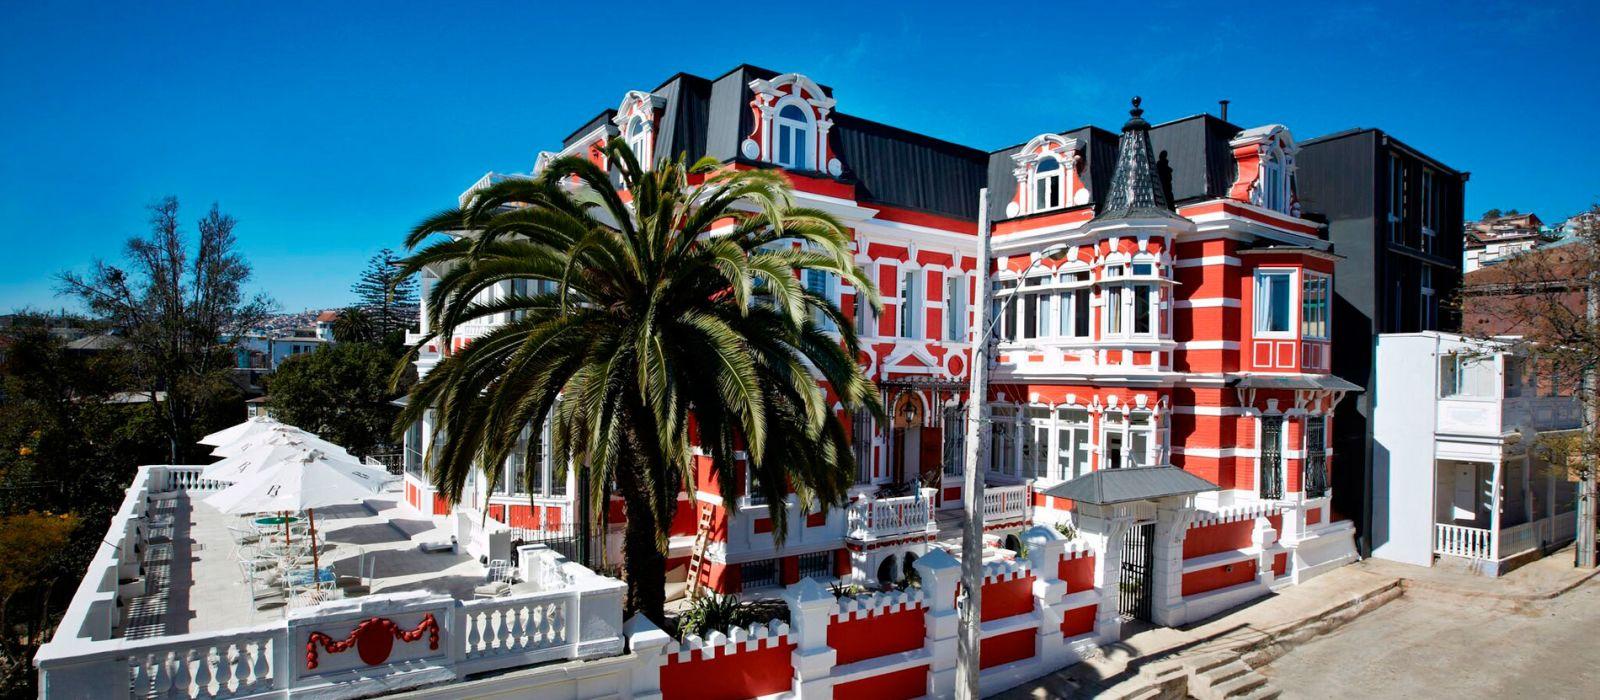 Hotel Palacio Astoreca Chile